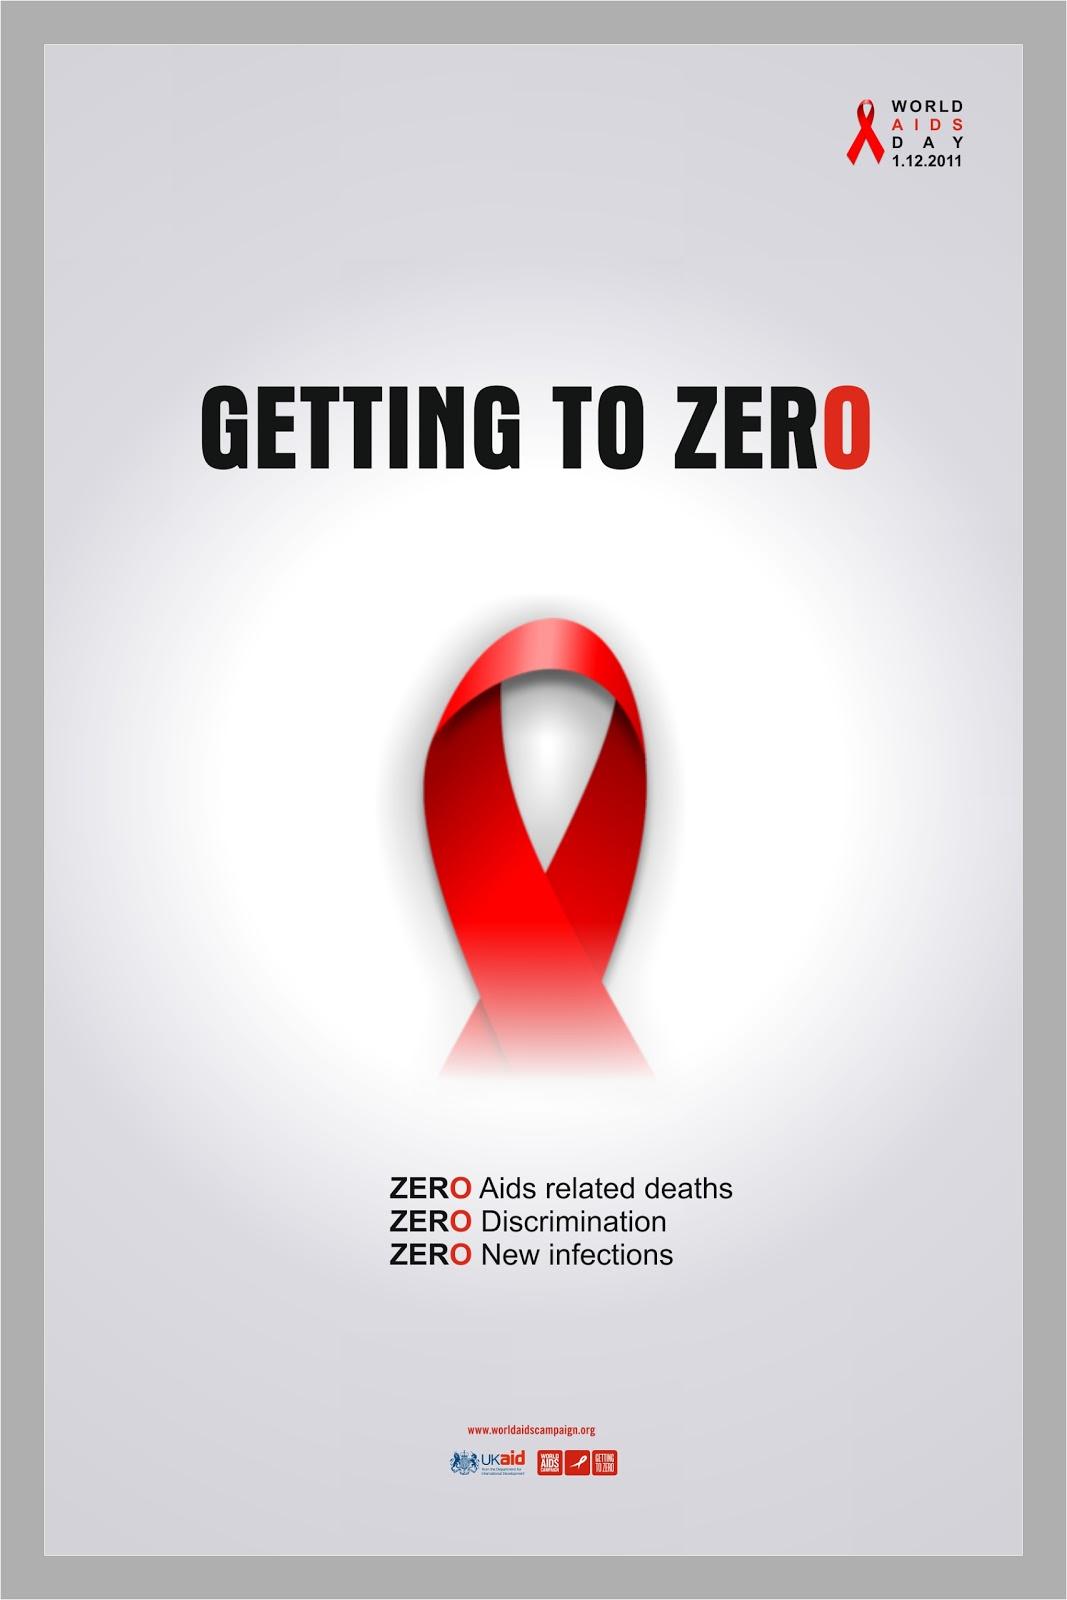 Narayana Prasad: WORLD AIDS DAY 2011 POSTER